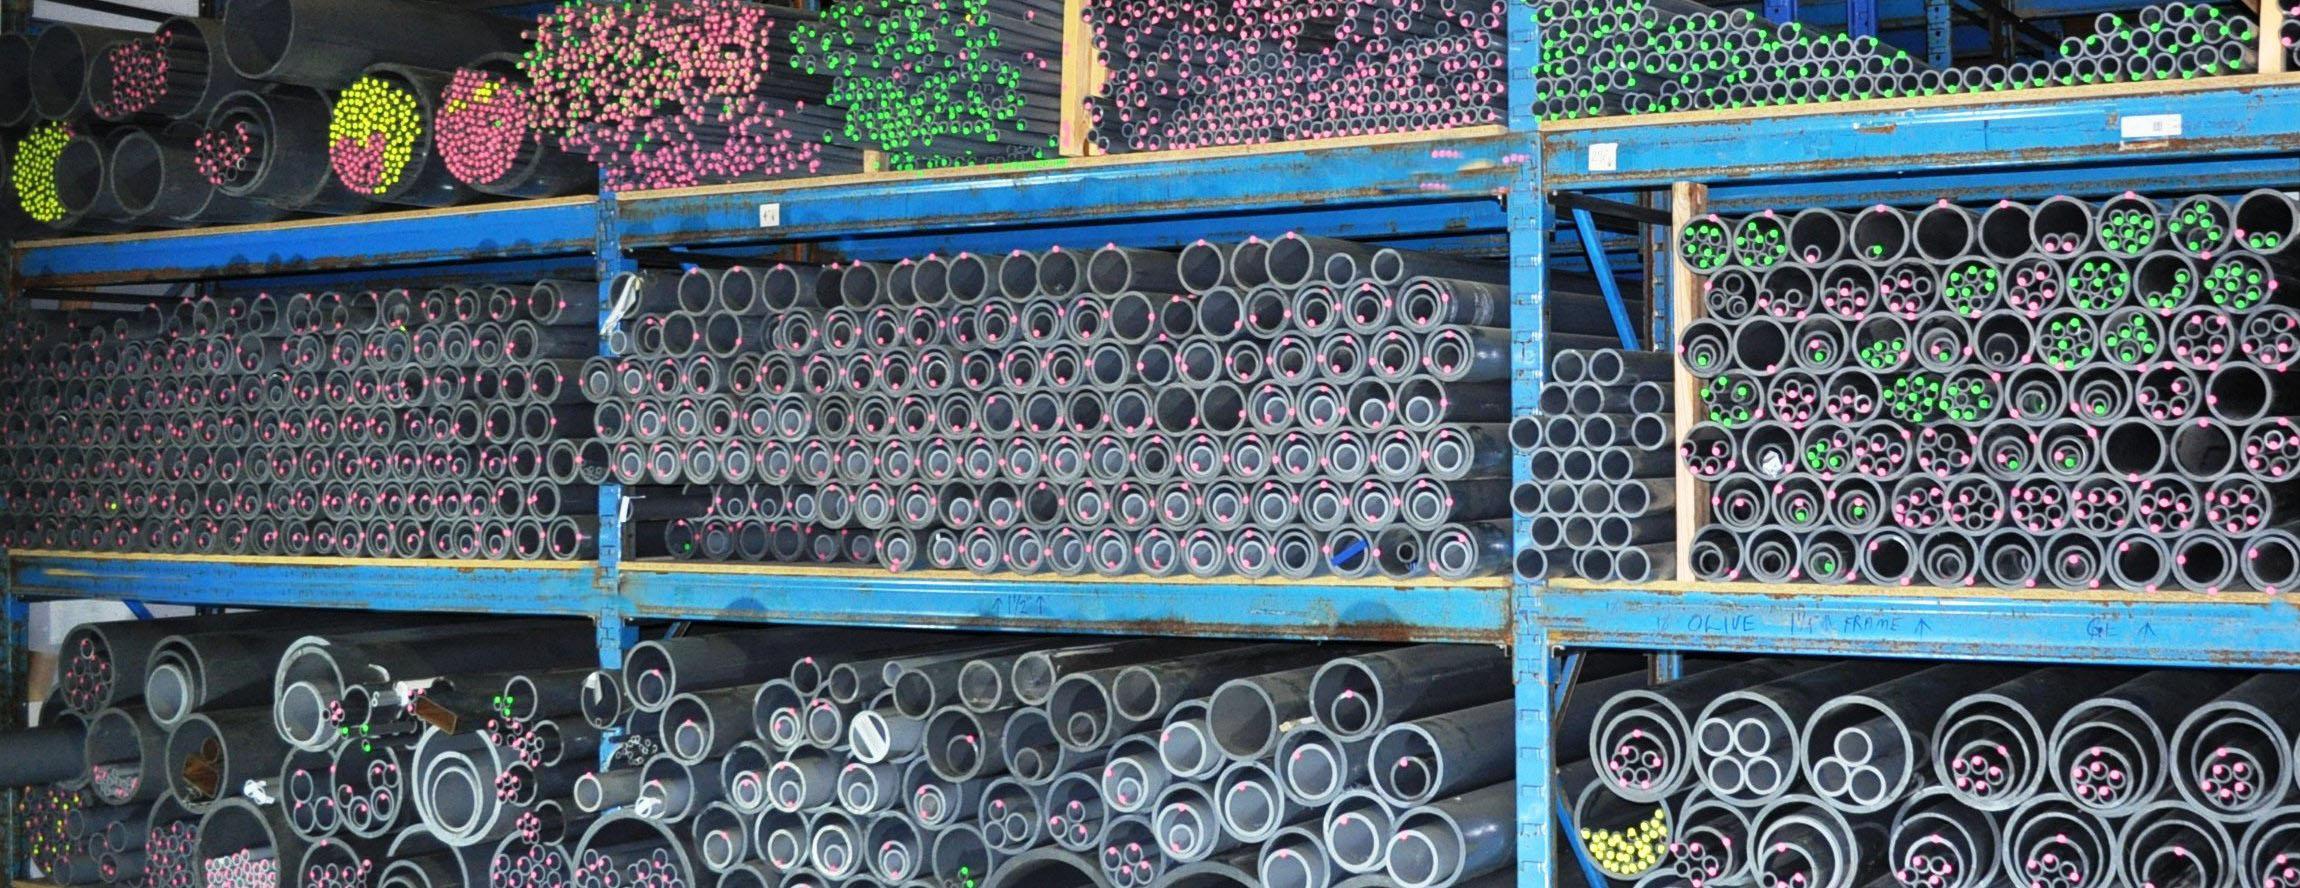 PVC & CPVC Pipe Stock